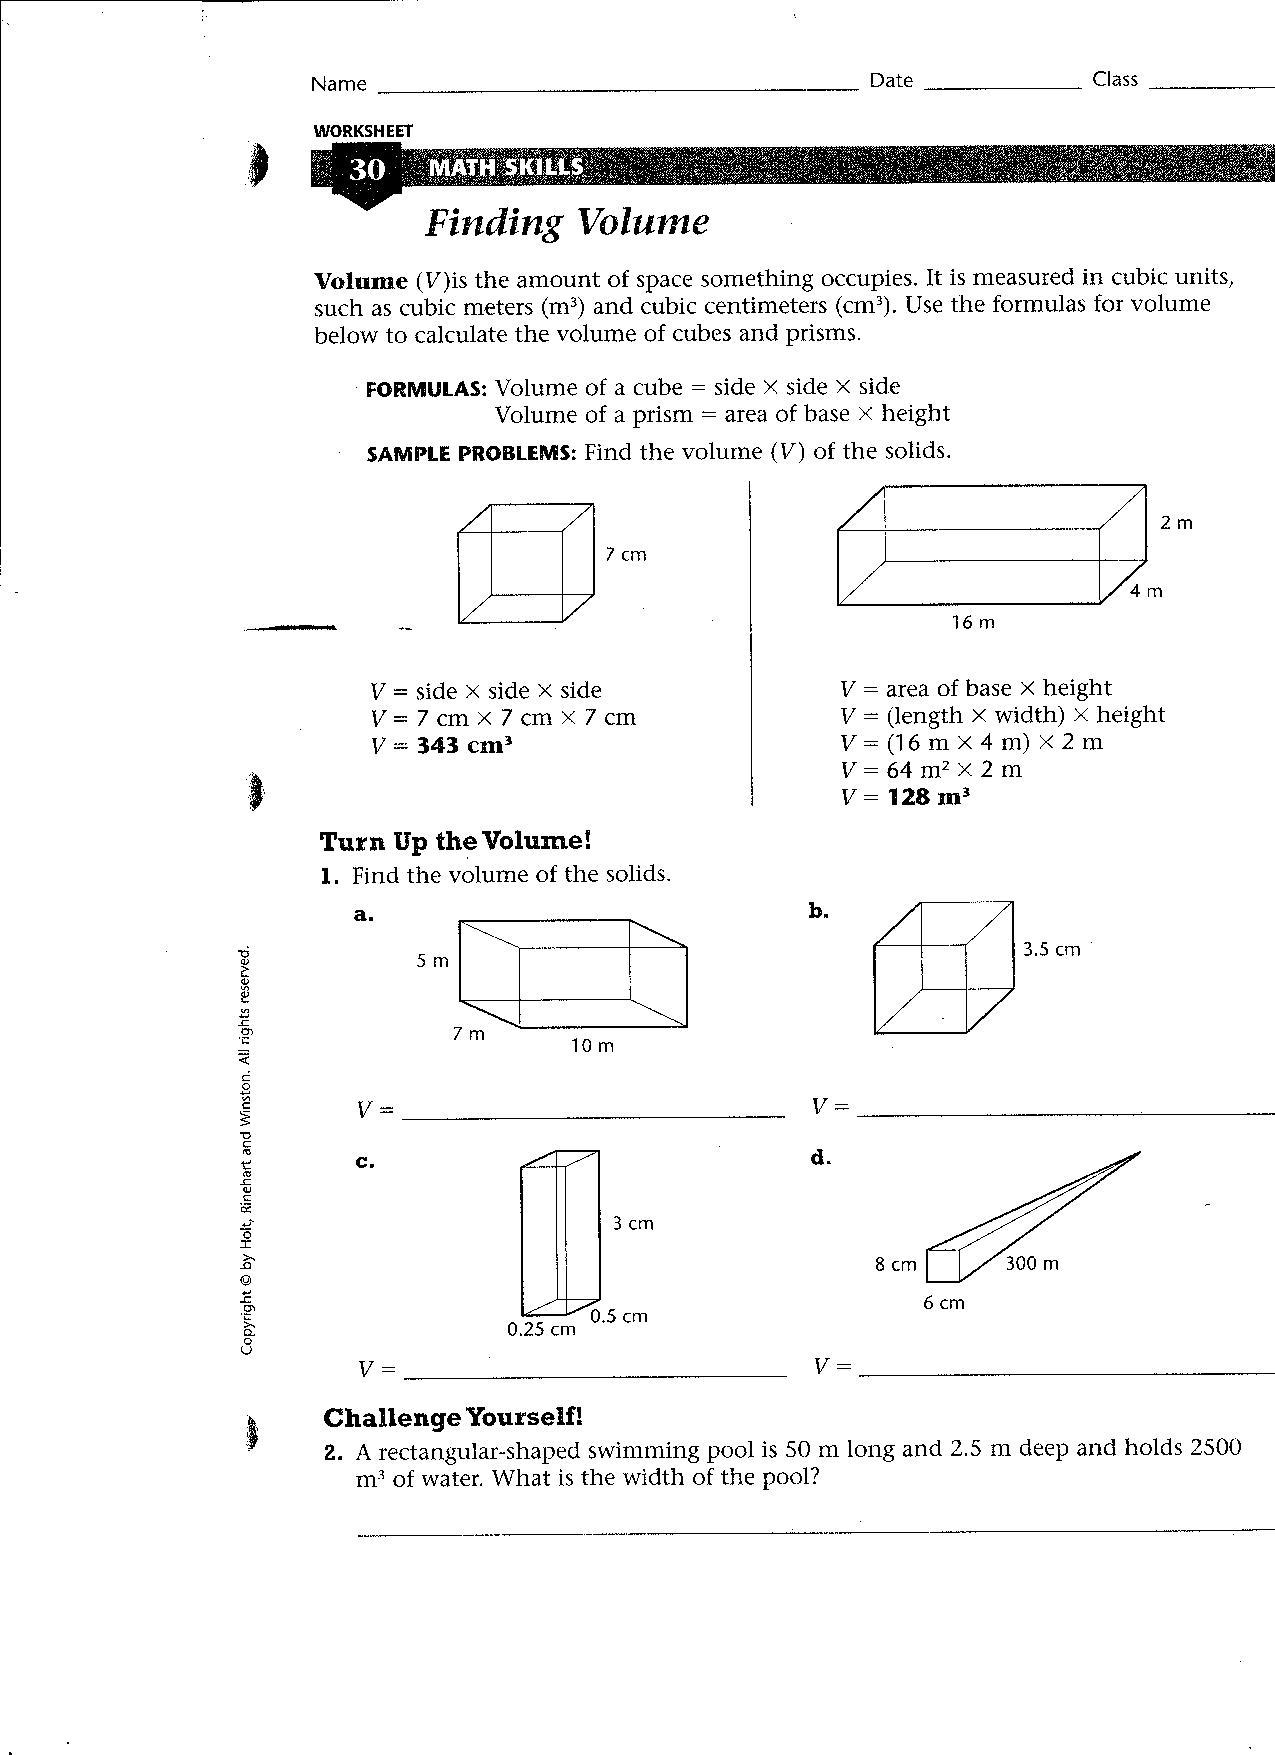 2 Finding Volume Worksheet